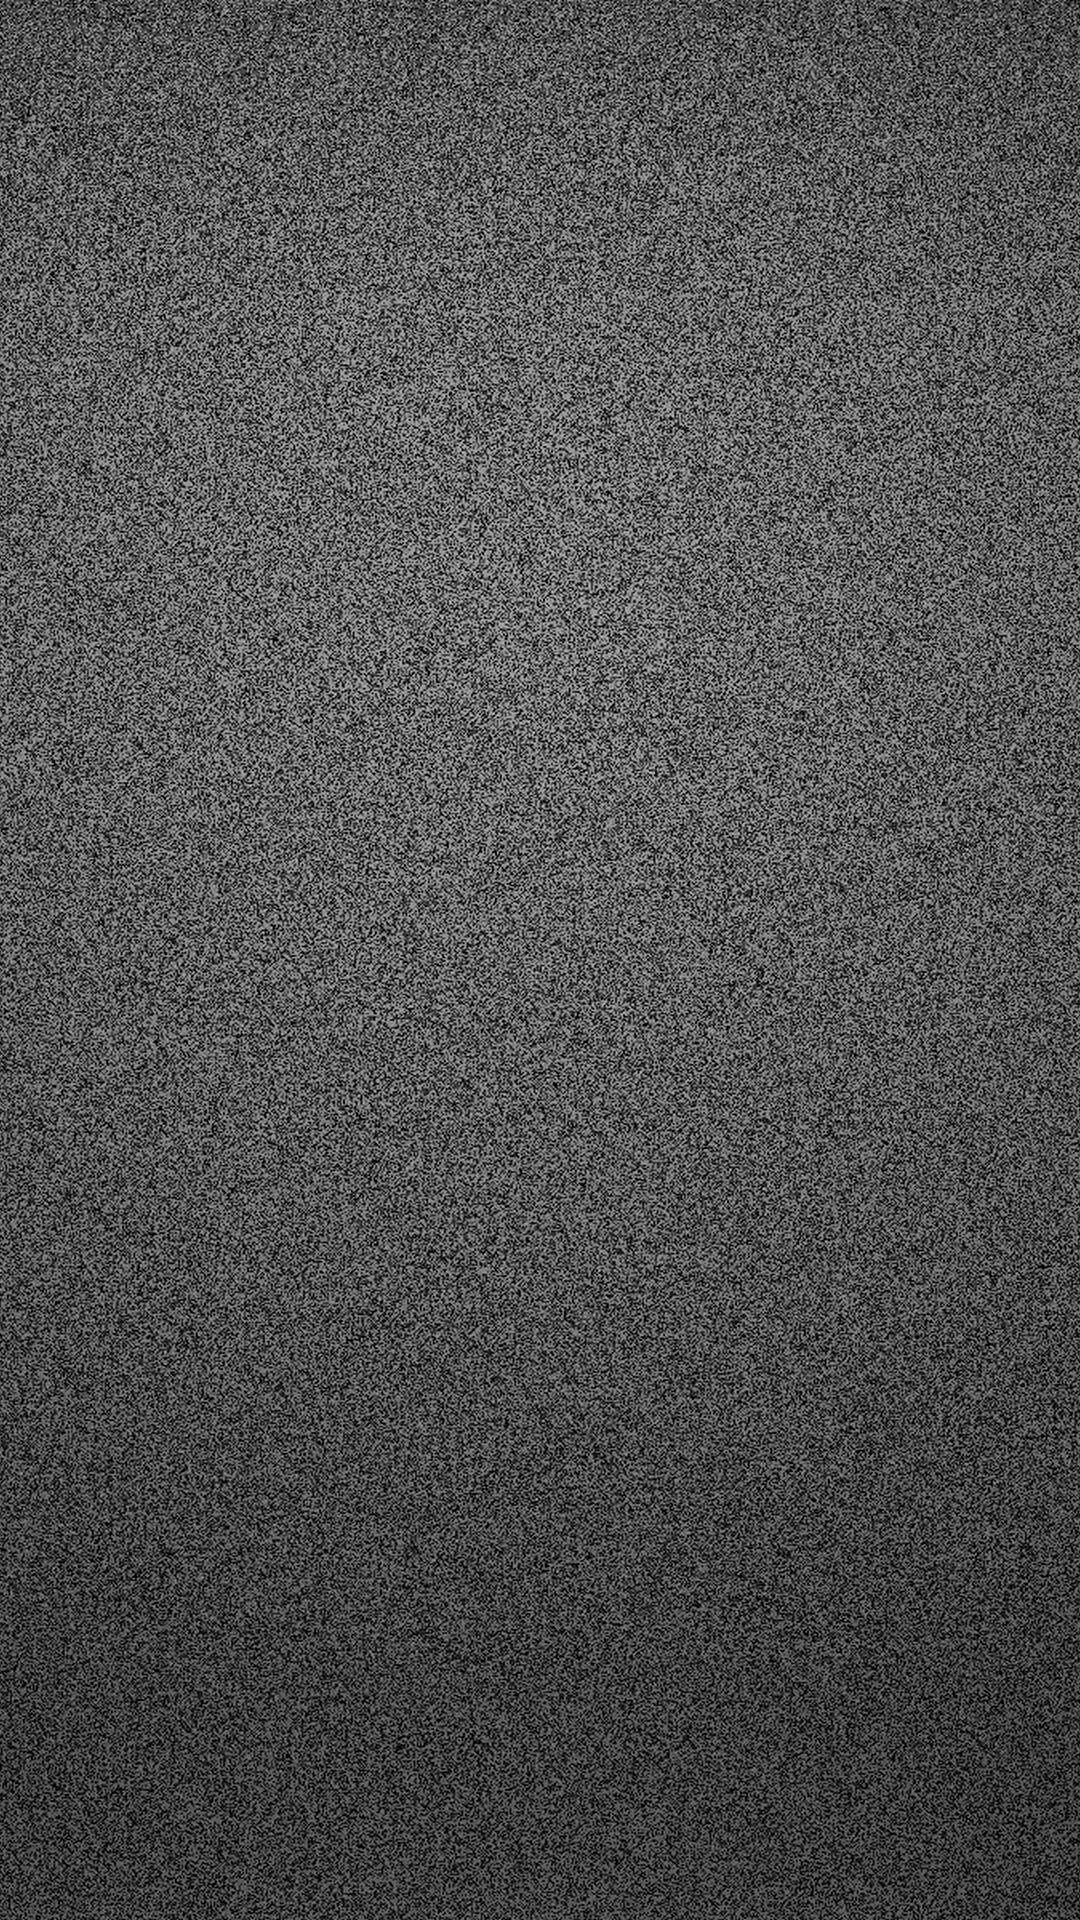 Wallpaper iphone unique - Iphone 6 Plus Wallpaper Dark Pattern 05 Iphone 6 Wallpapers Iphone 6